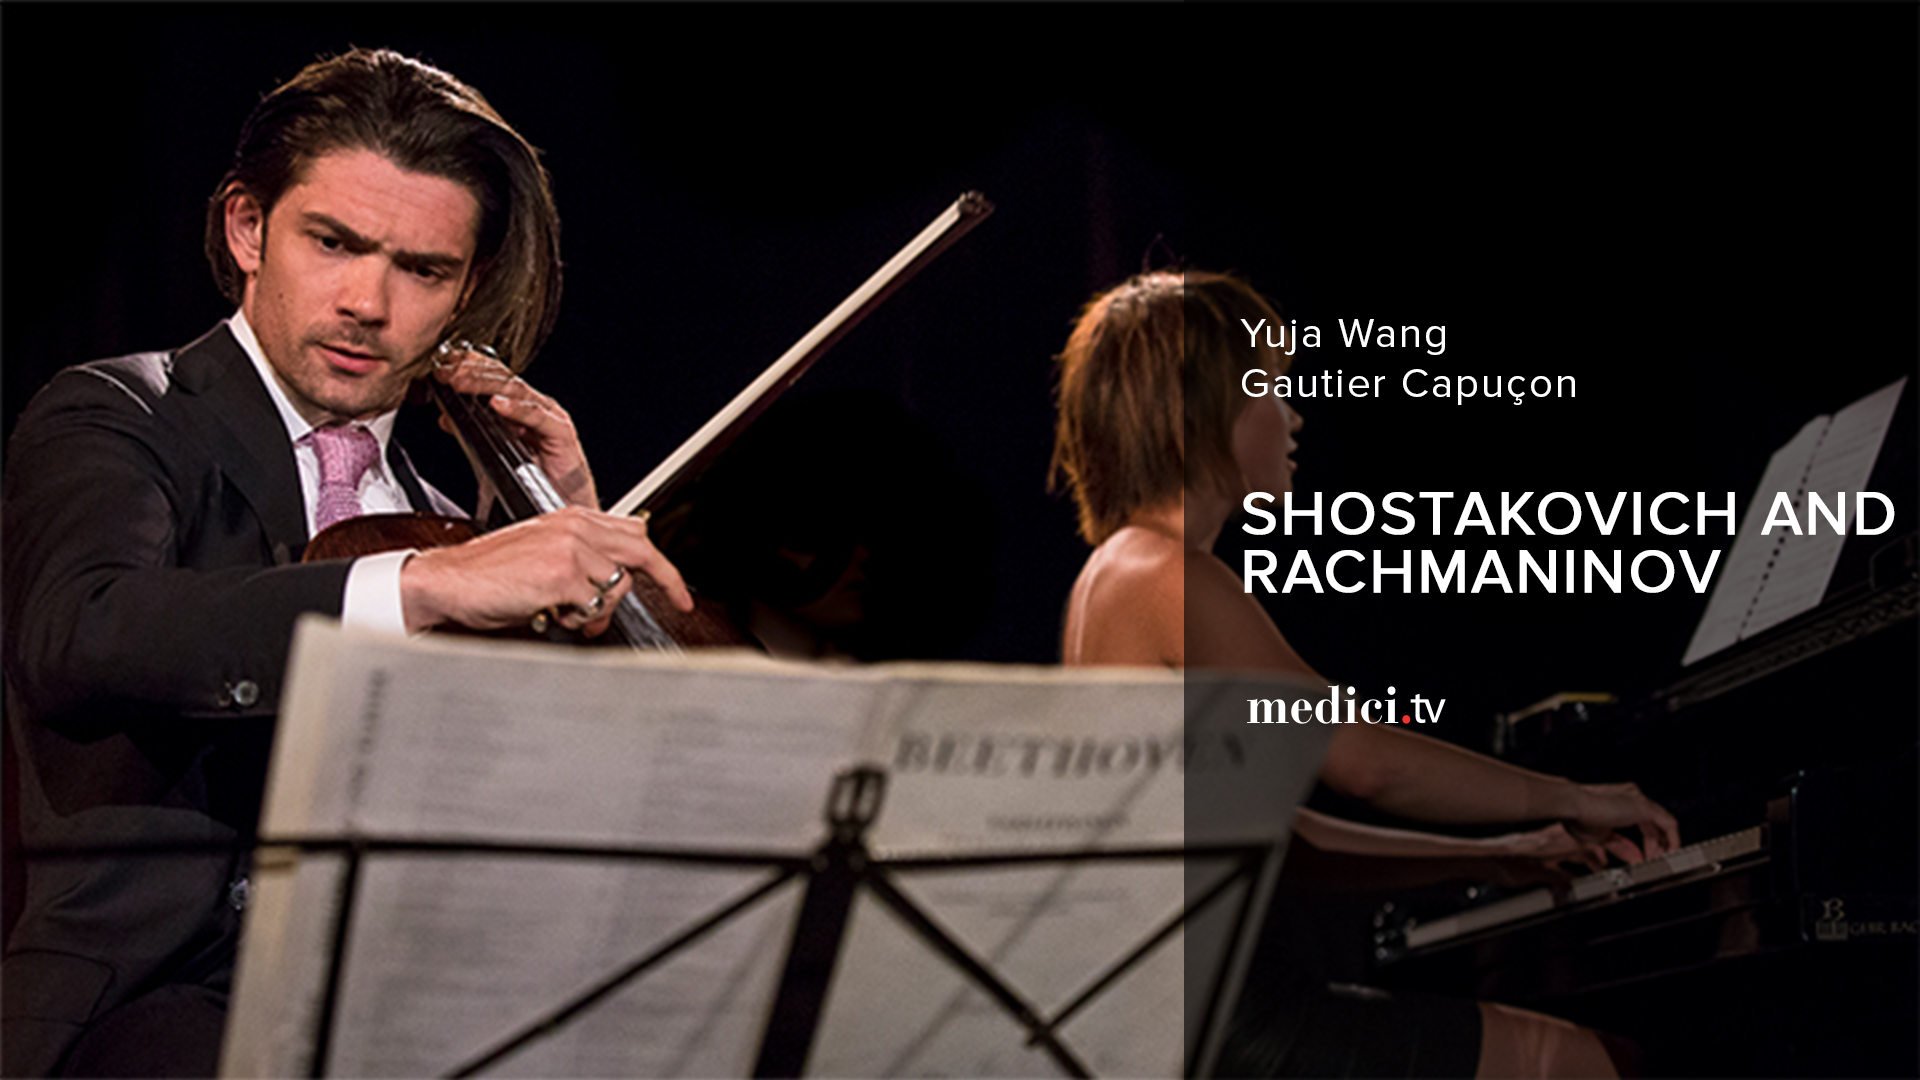 Yuja Wang and Gautier Capuçon play Shostakovich and Rachmaninov - Verbier Festival 2013